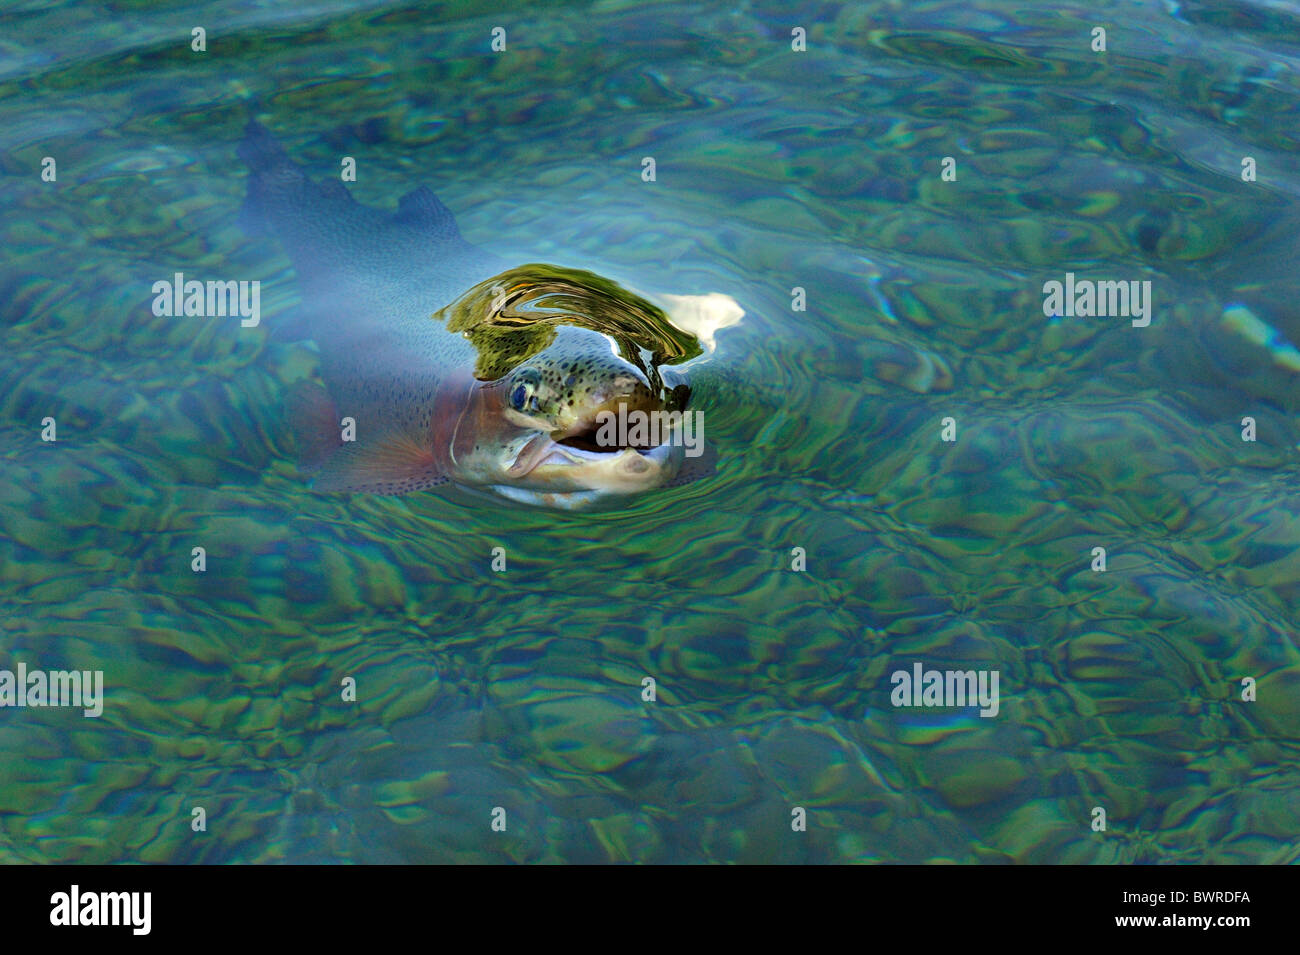 La truite arc-en-ciel, Oncorhynchus mykiss, captive Photo Stock